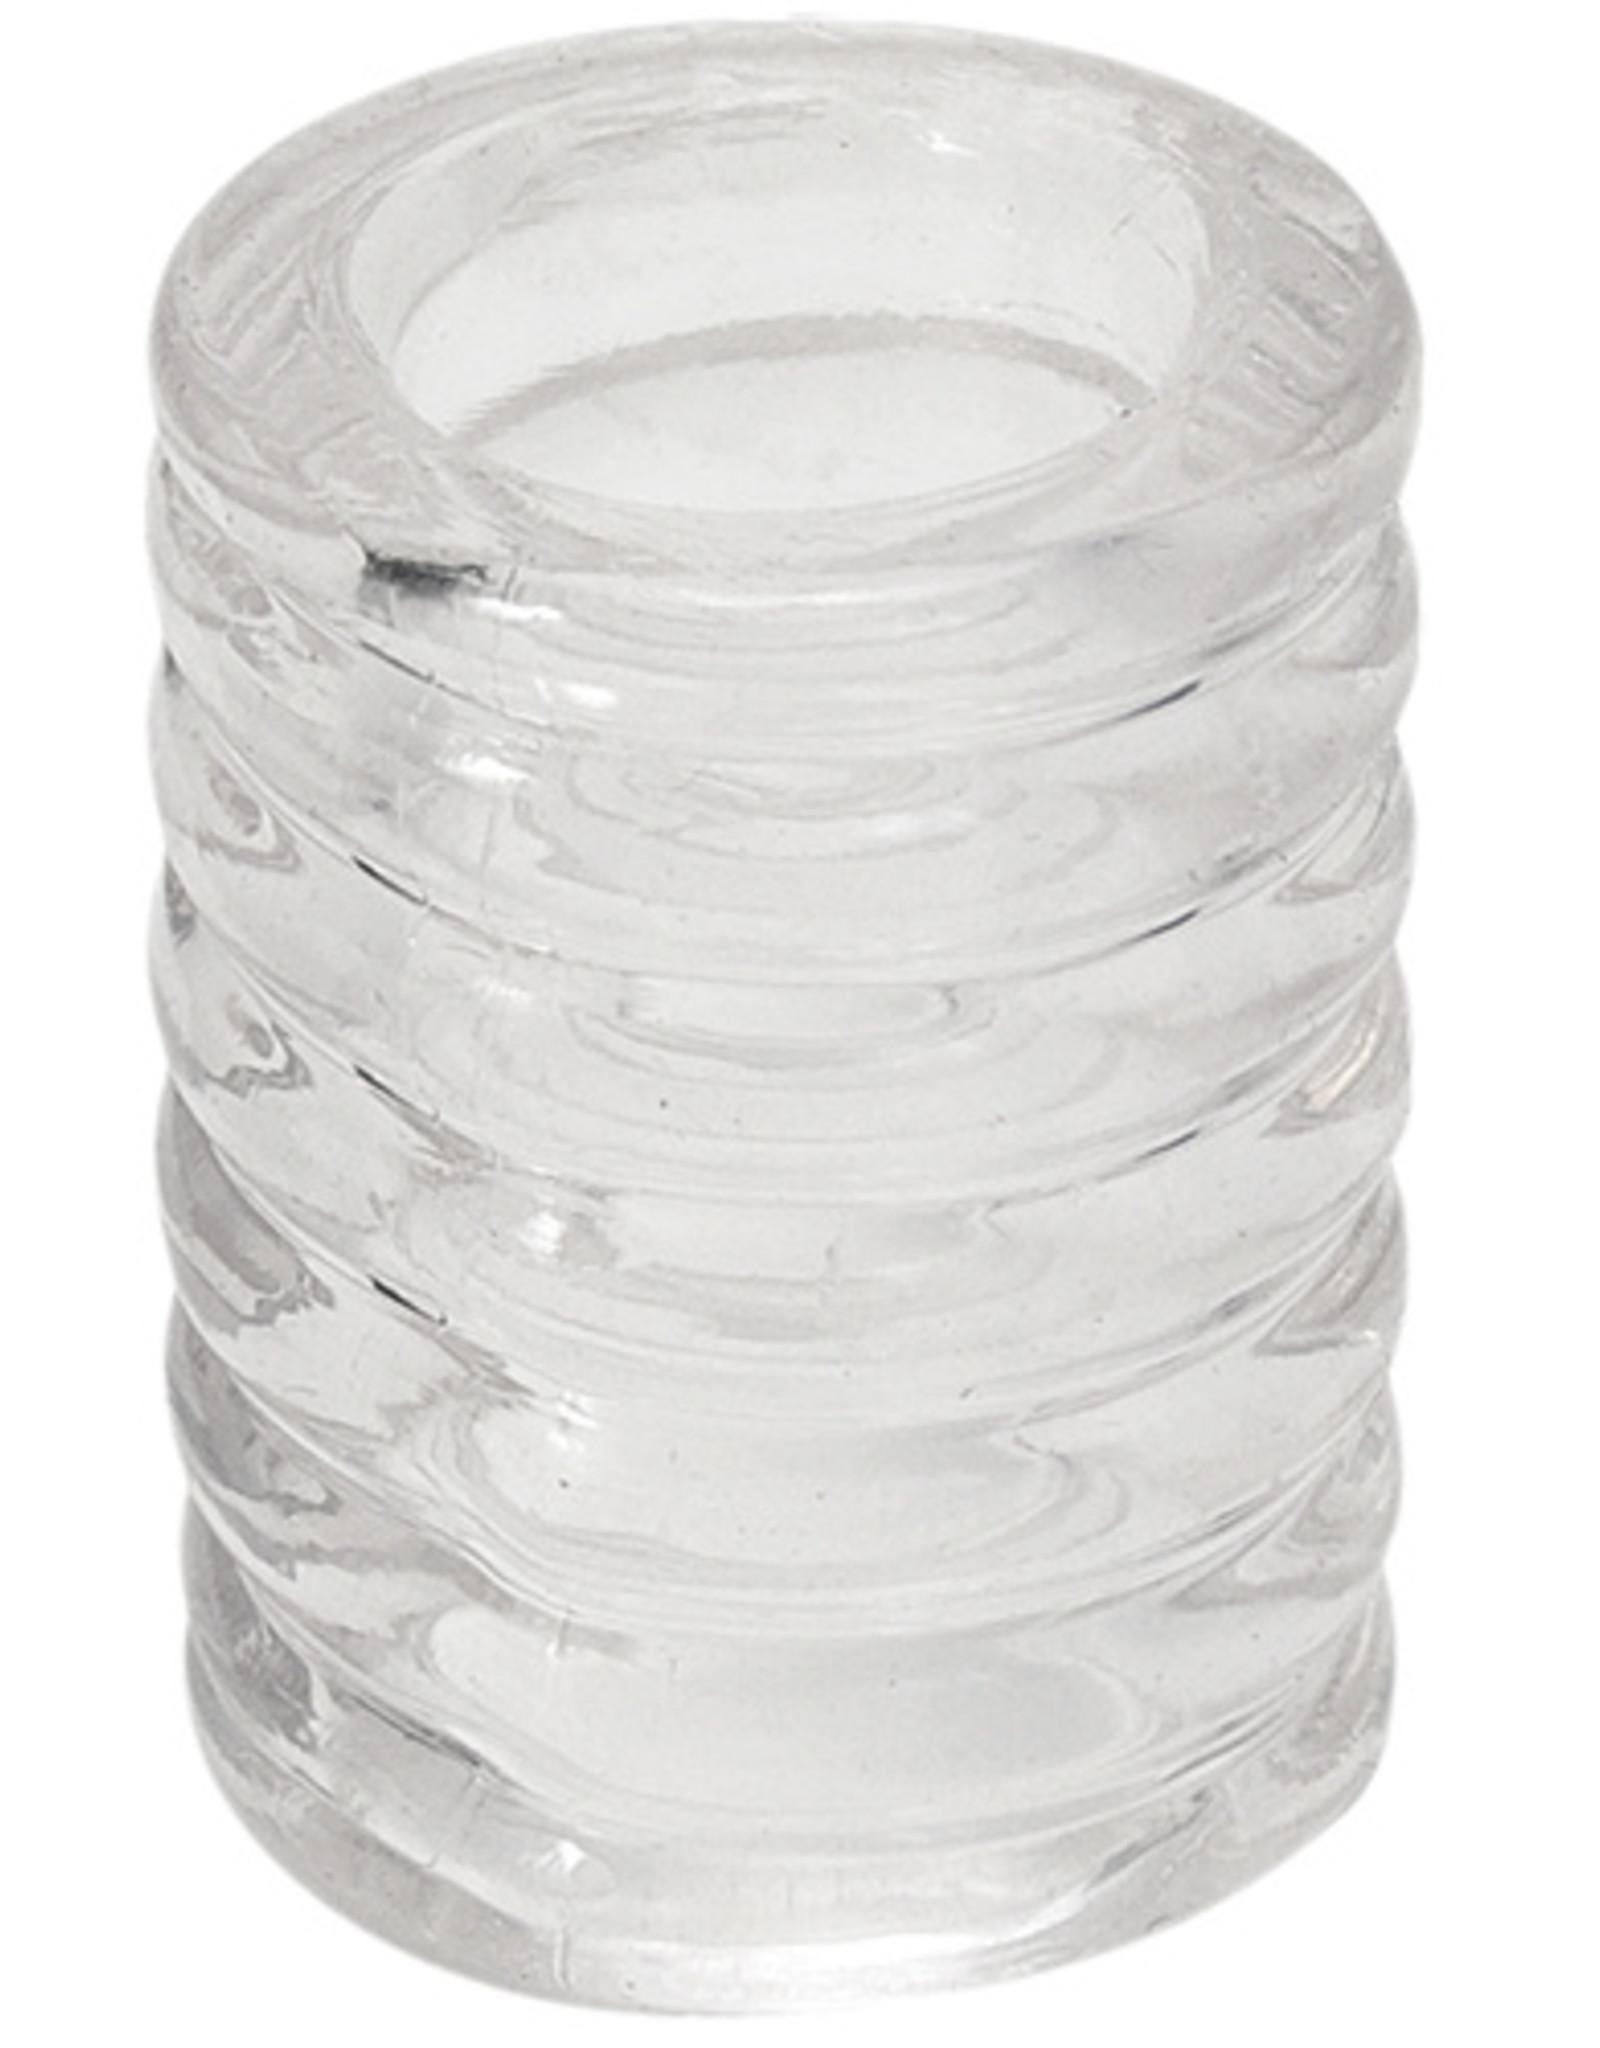 Titanmen Cockcage - Transparant